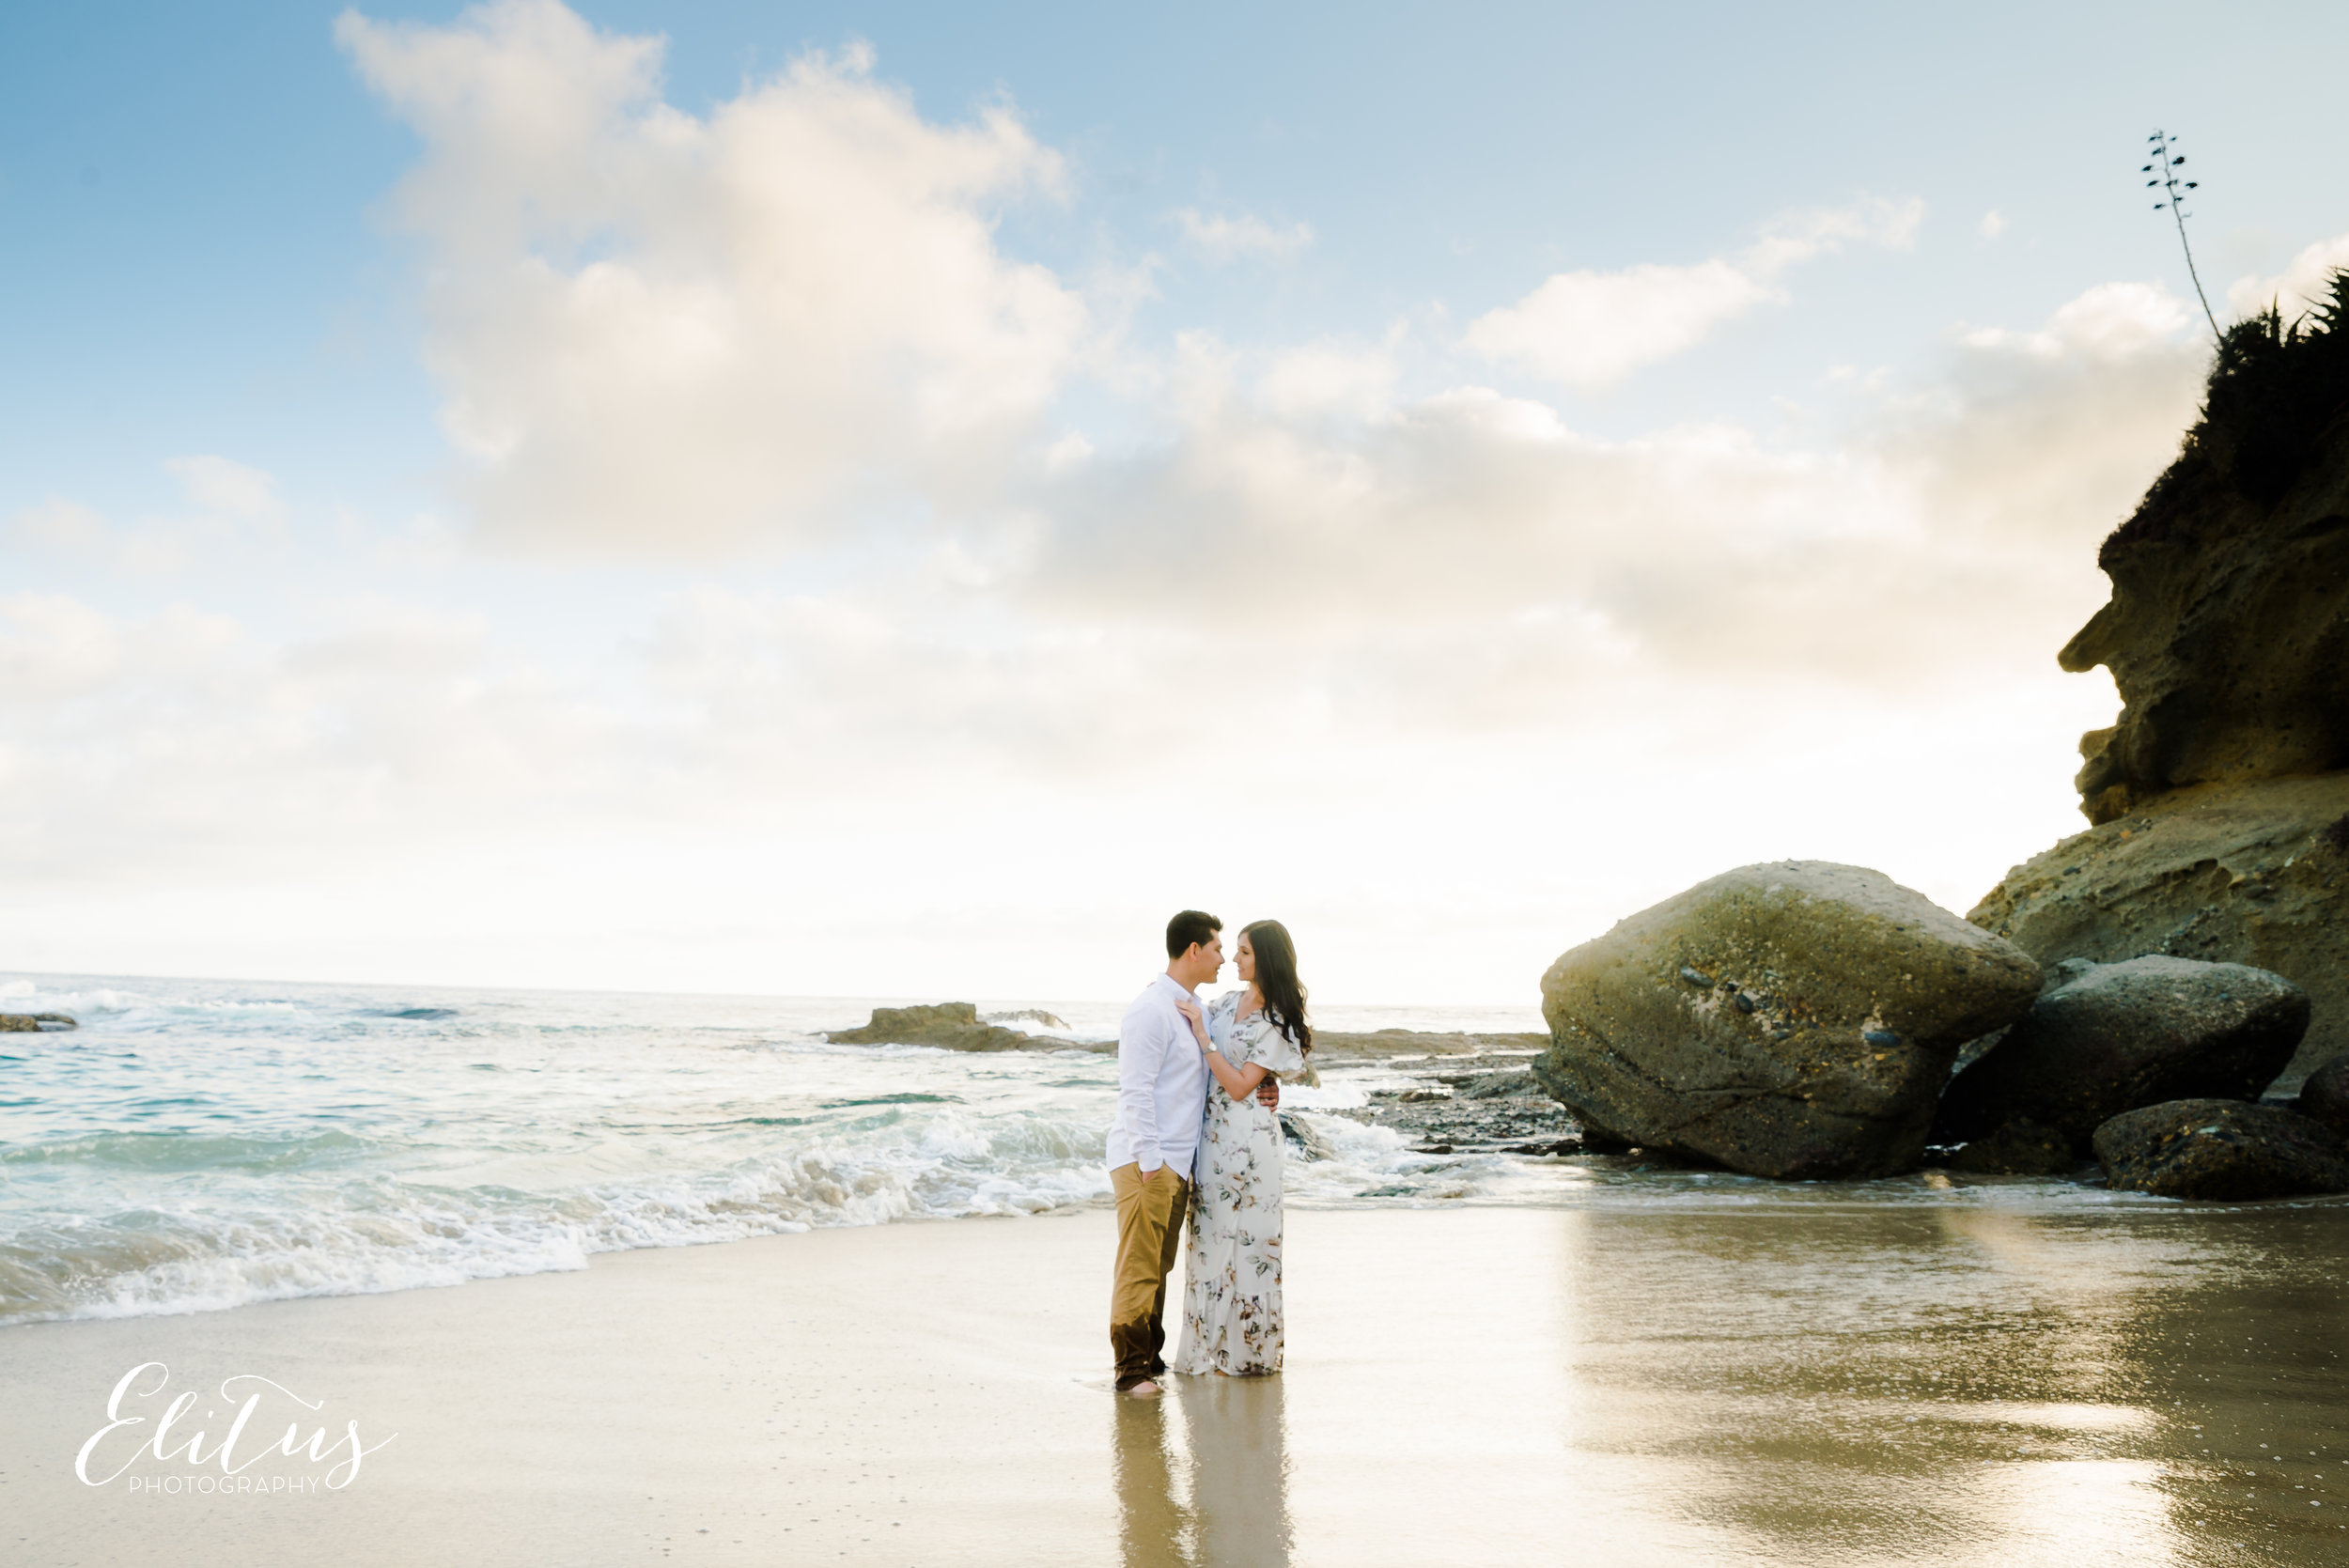 elitus-photograpy-laguna-beach-marisol-benito-engagement (110 of 115).jpg